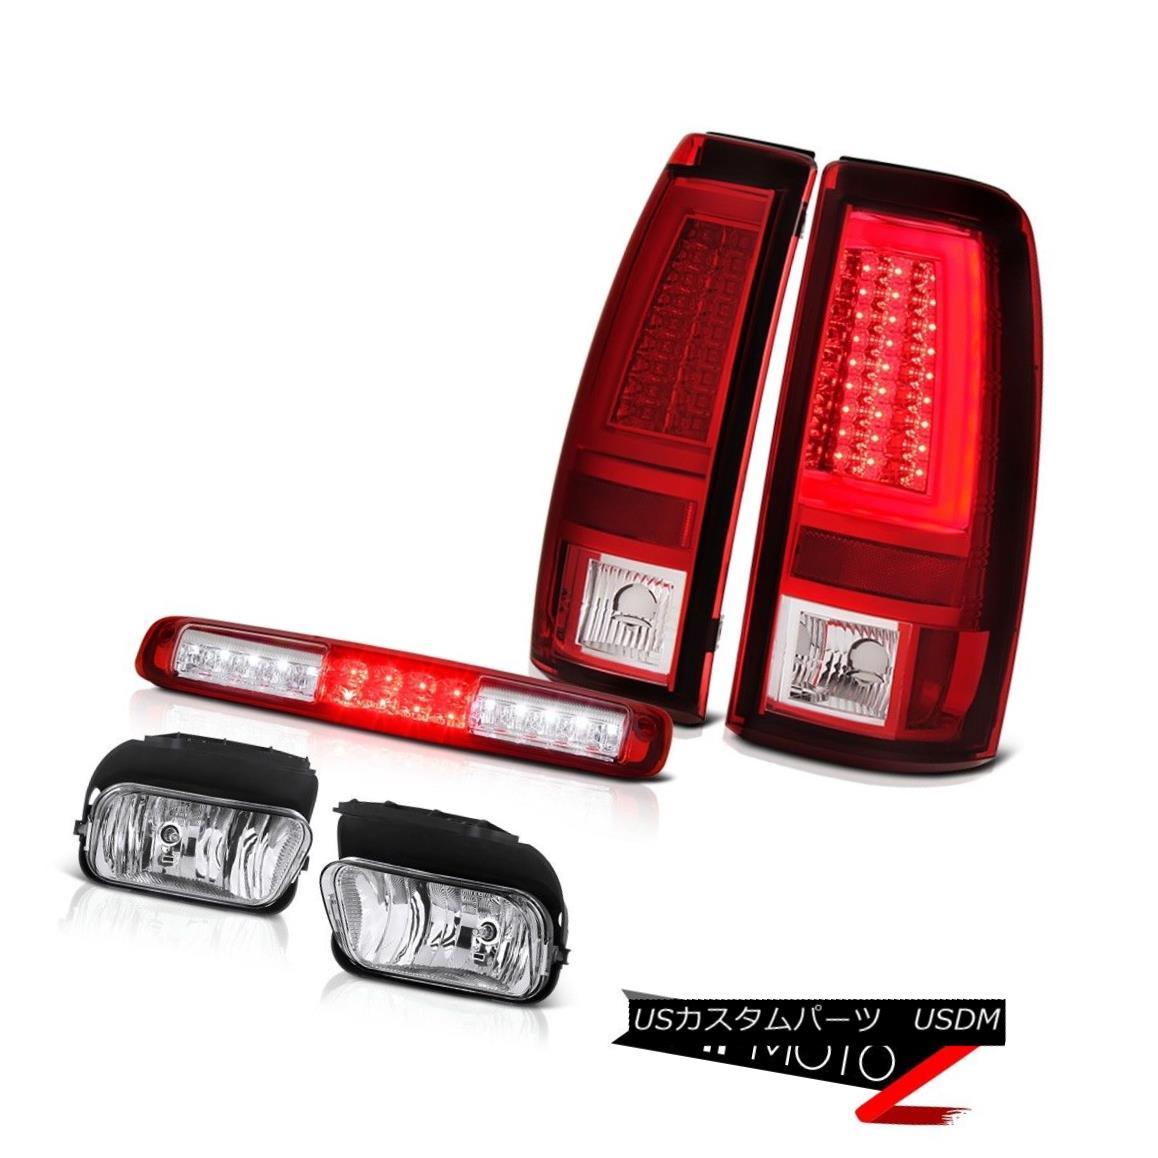 <title>車用品 バイク用品 >> パーツ ライト ランプ テールライト 2003-2006 Silverado 1500 Parking Brake Lights Foglamps Third Lamp 中古